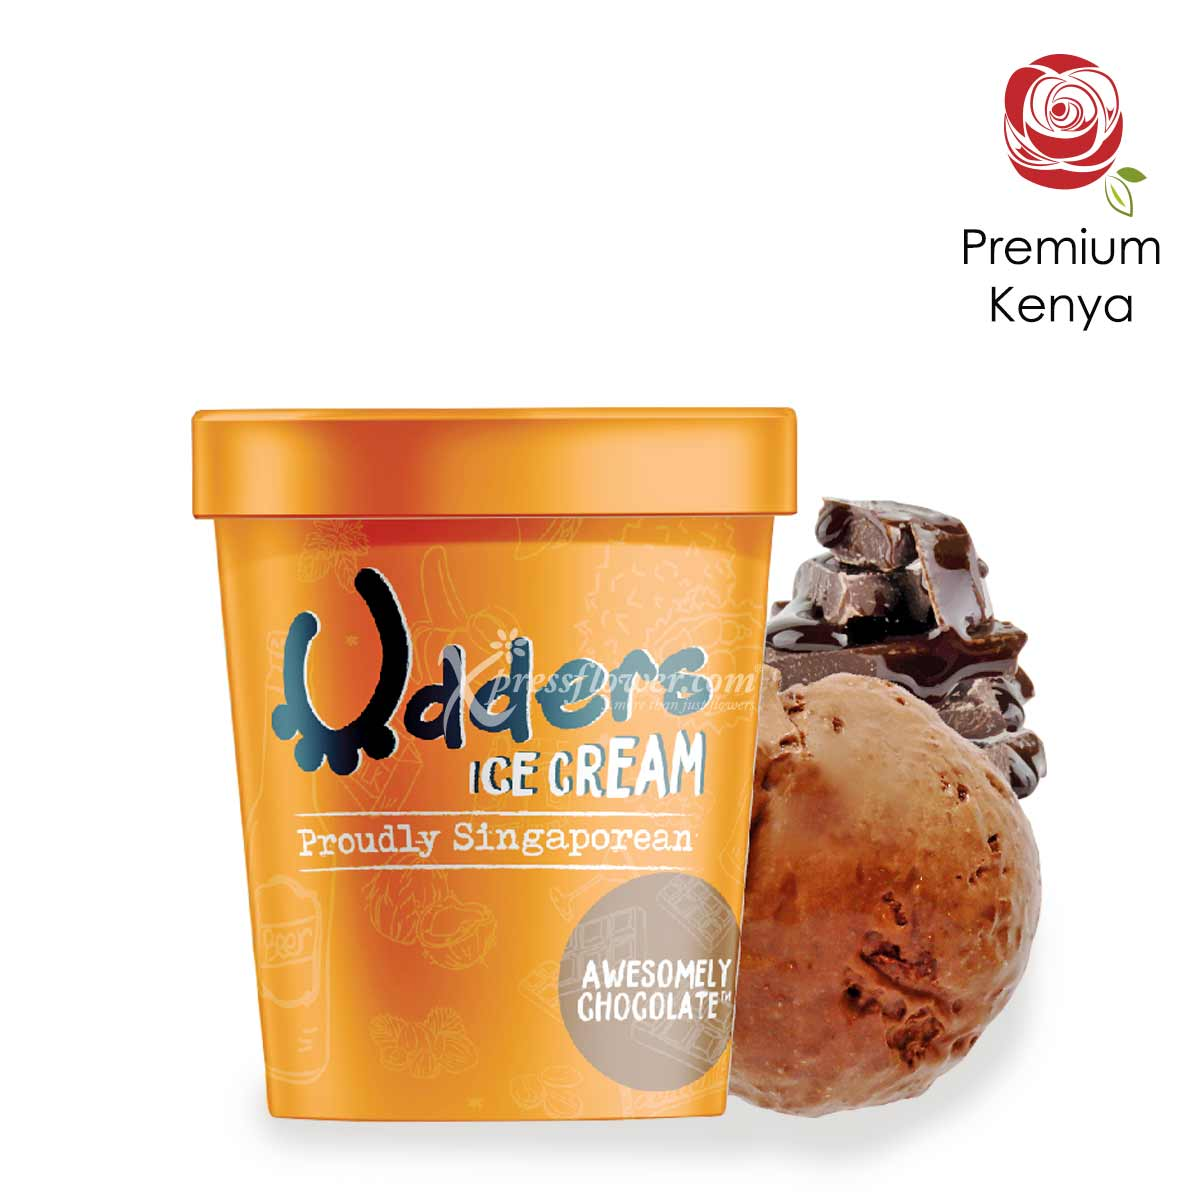 UD1801 Sweet Happiness Udders Ice Cream